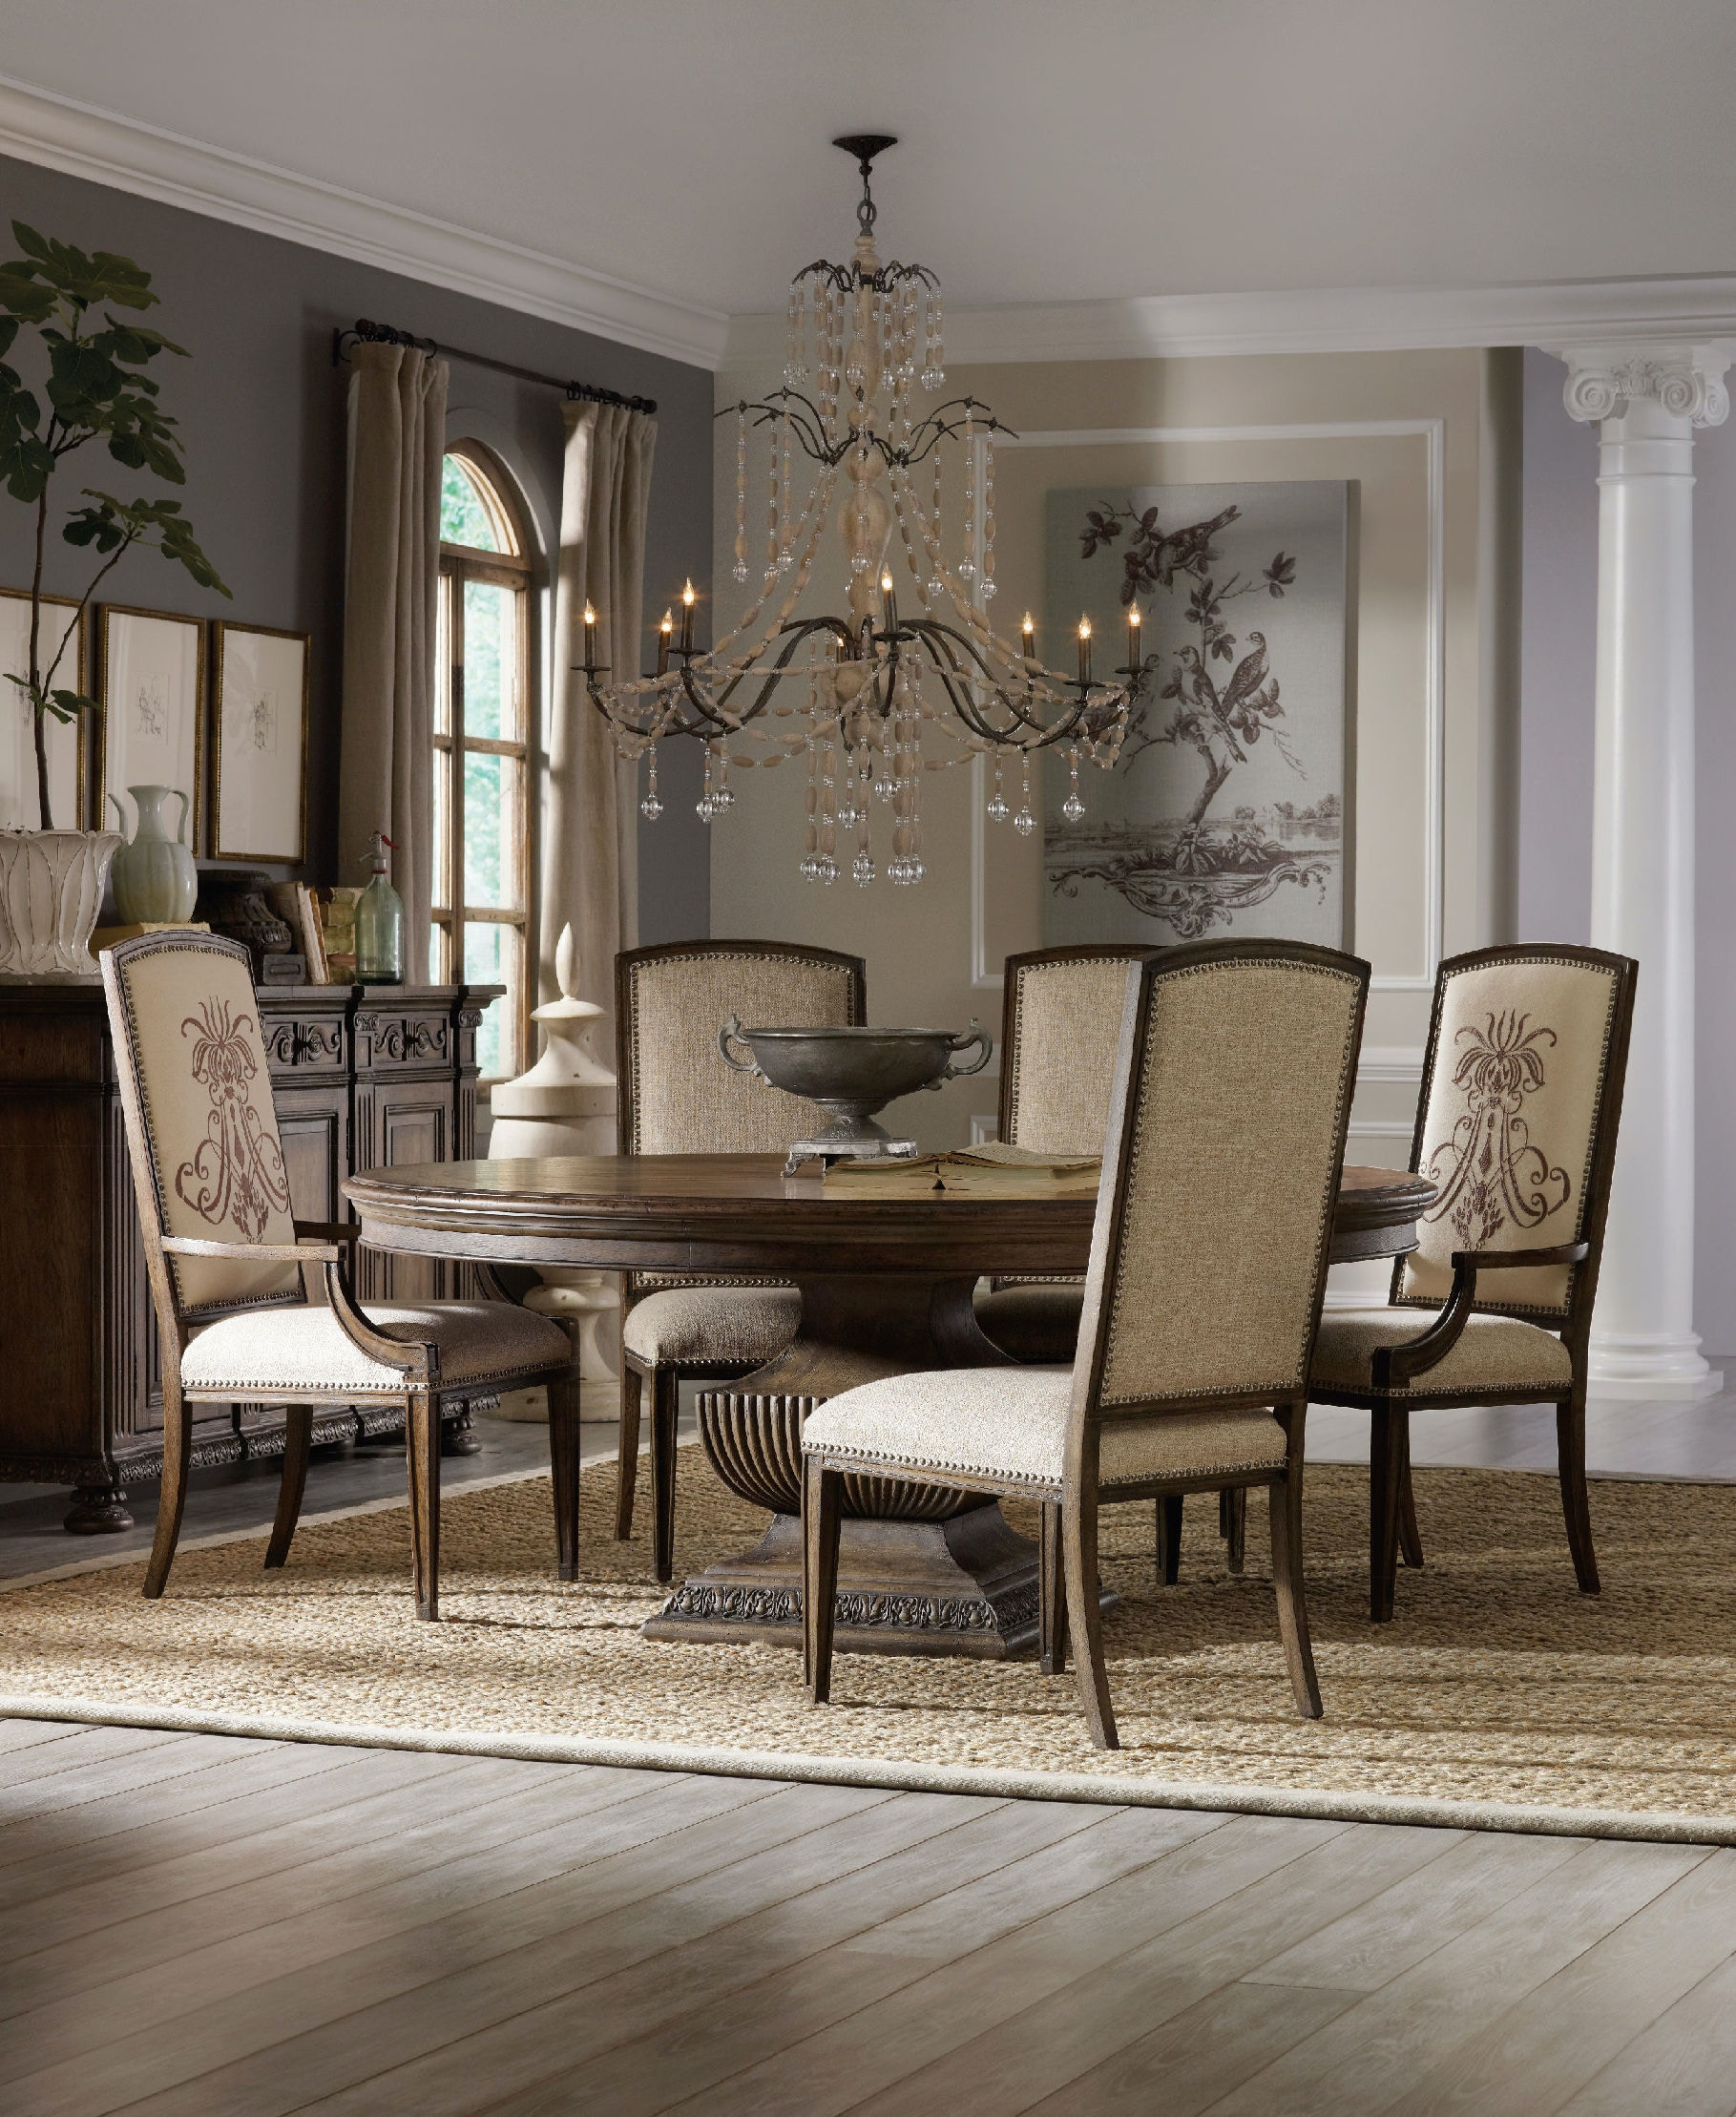 "Round Dining Room Furniture: Hooker Furniture Dining Room Rhapsody 72"" Round Dining"